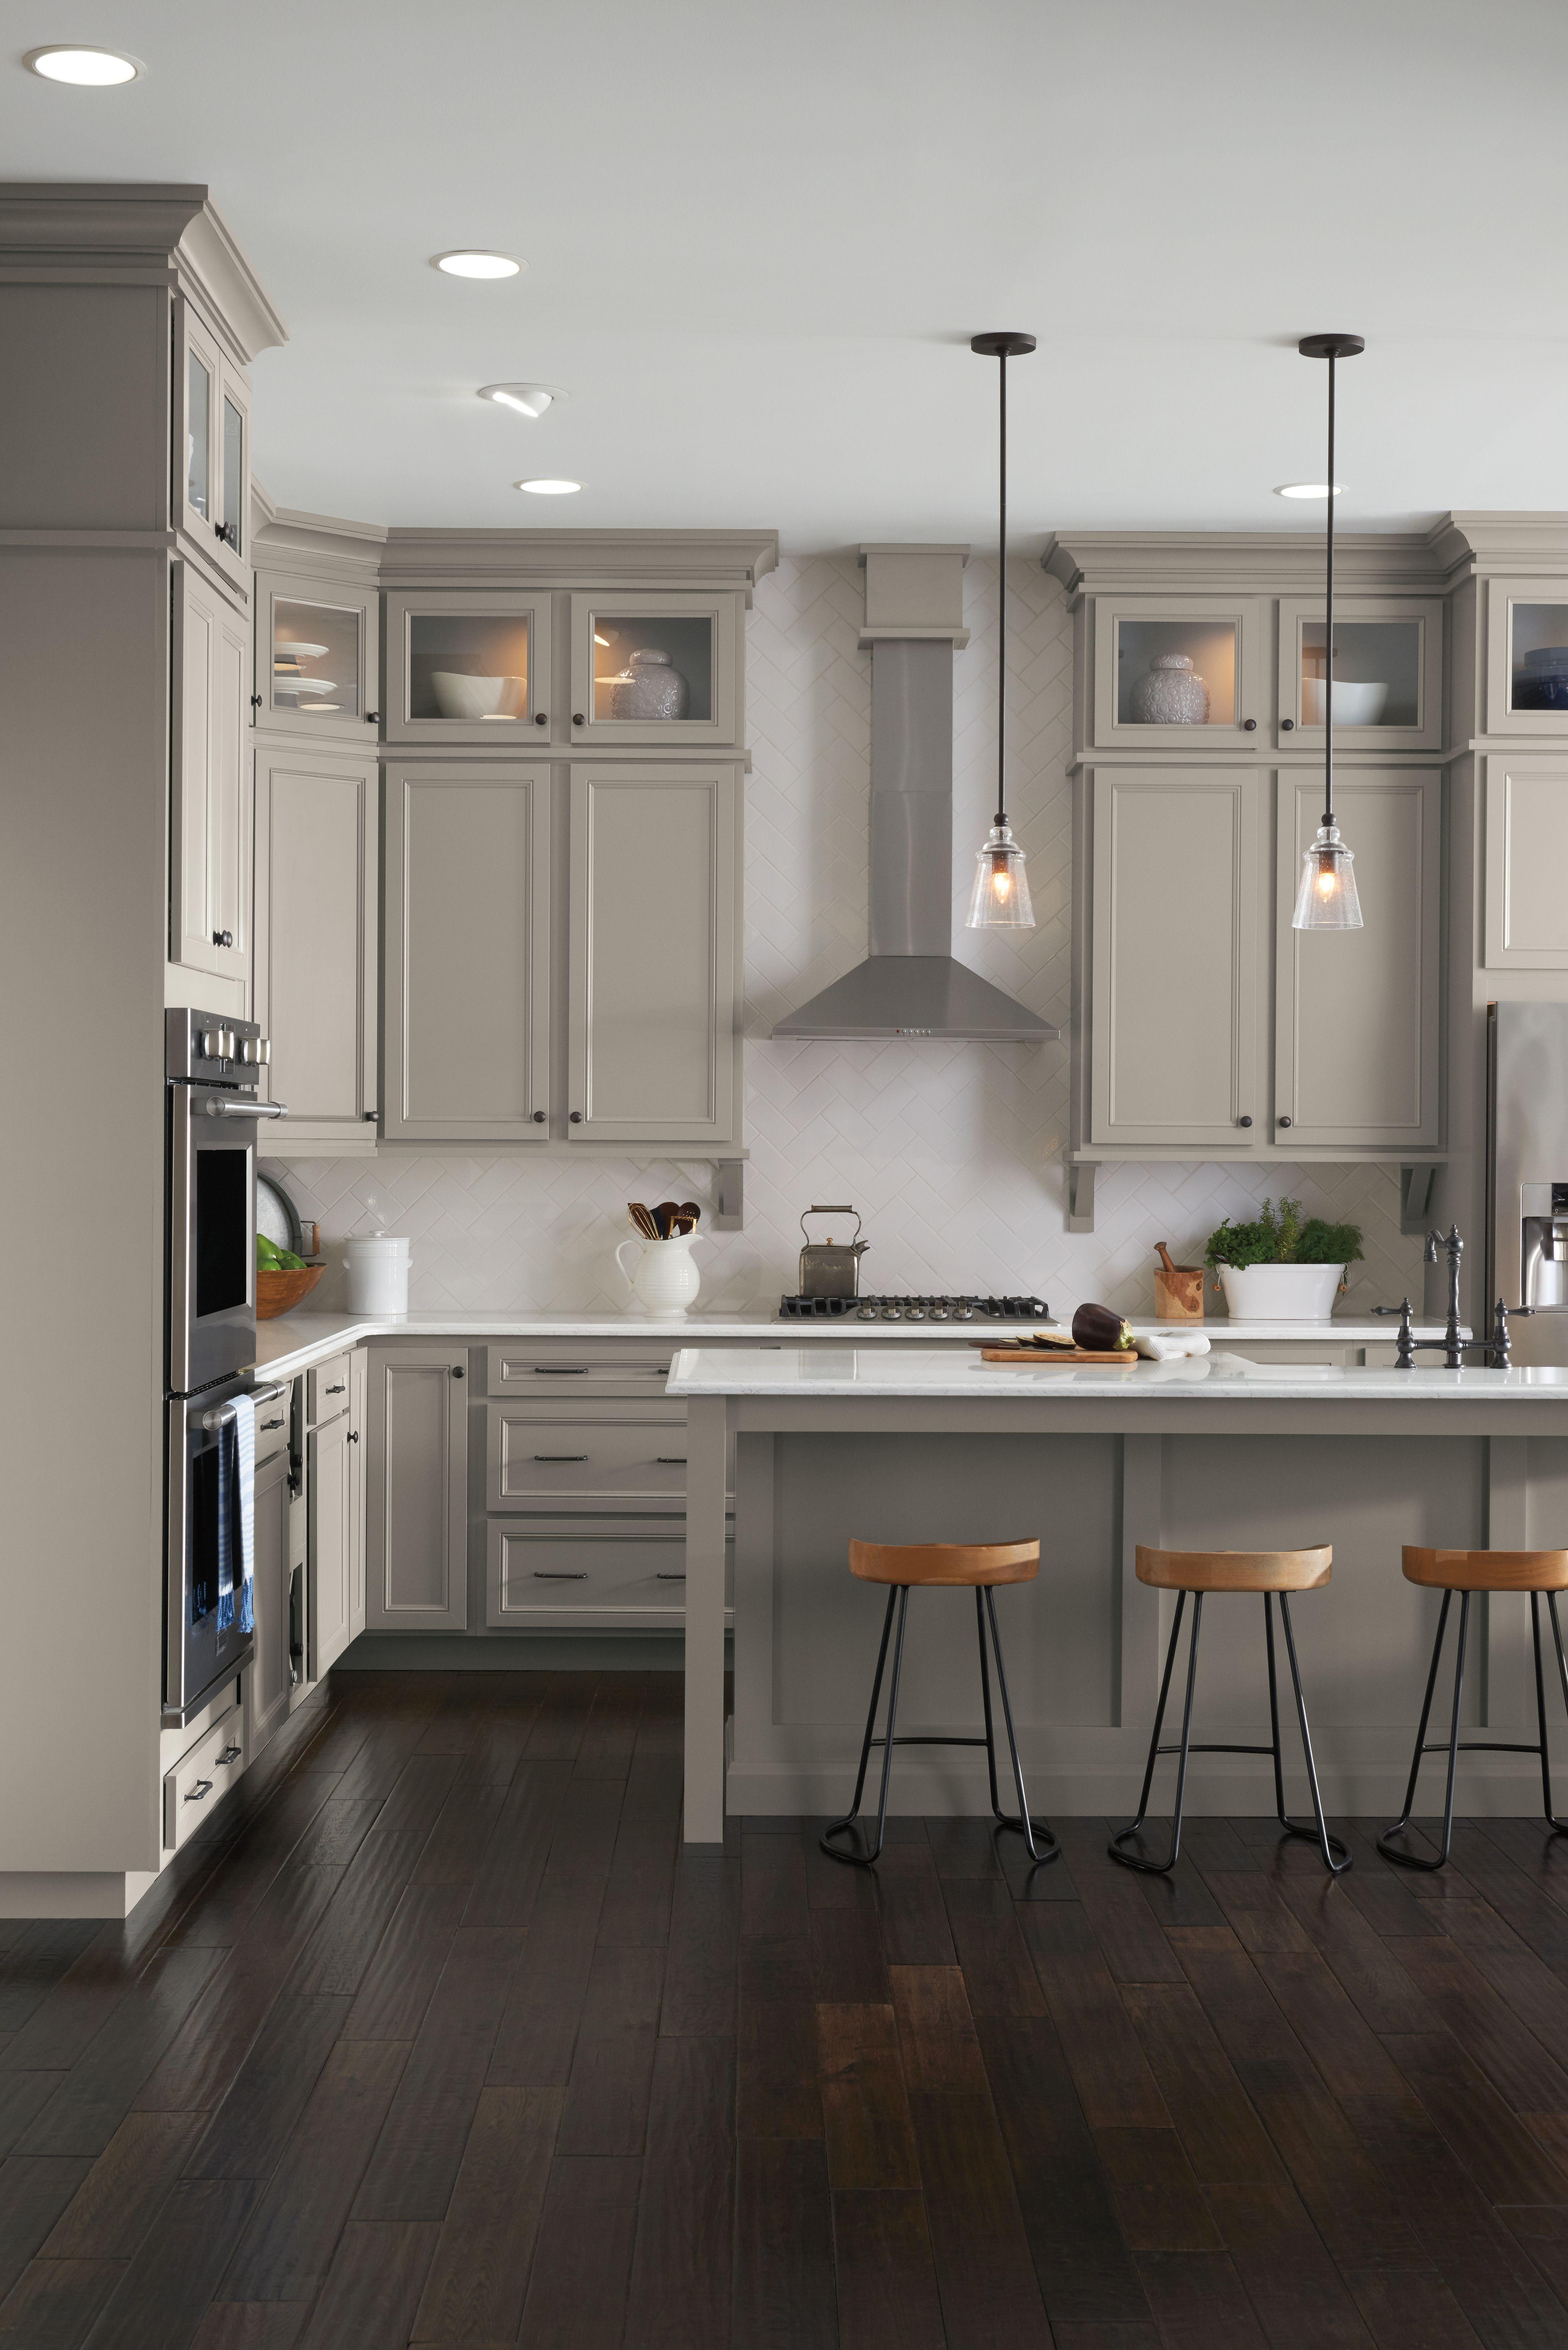 Aristokraft Cabinets In 2020 American Kitchen Design Kitchen Design Modern Kitchen Design